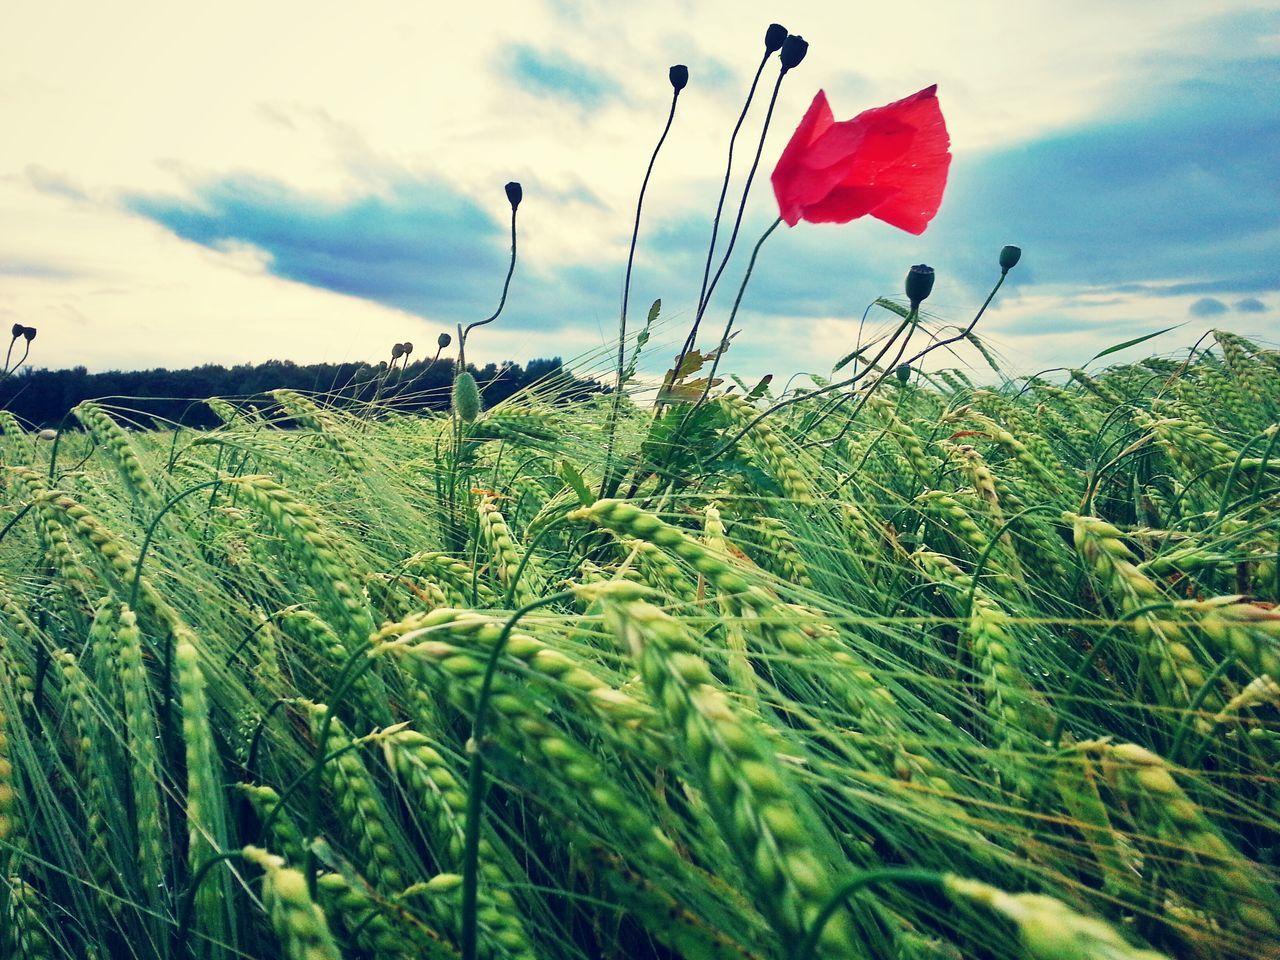 Allgäu Deutschland Field Germania Germany Green Gräser Grün Mohnblume Nature Nature Outdoors Papavero Plant Poppy Poppy Flowers Tranquility Verde